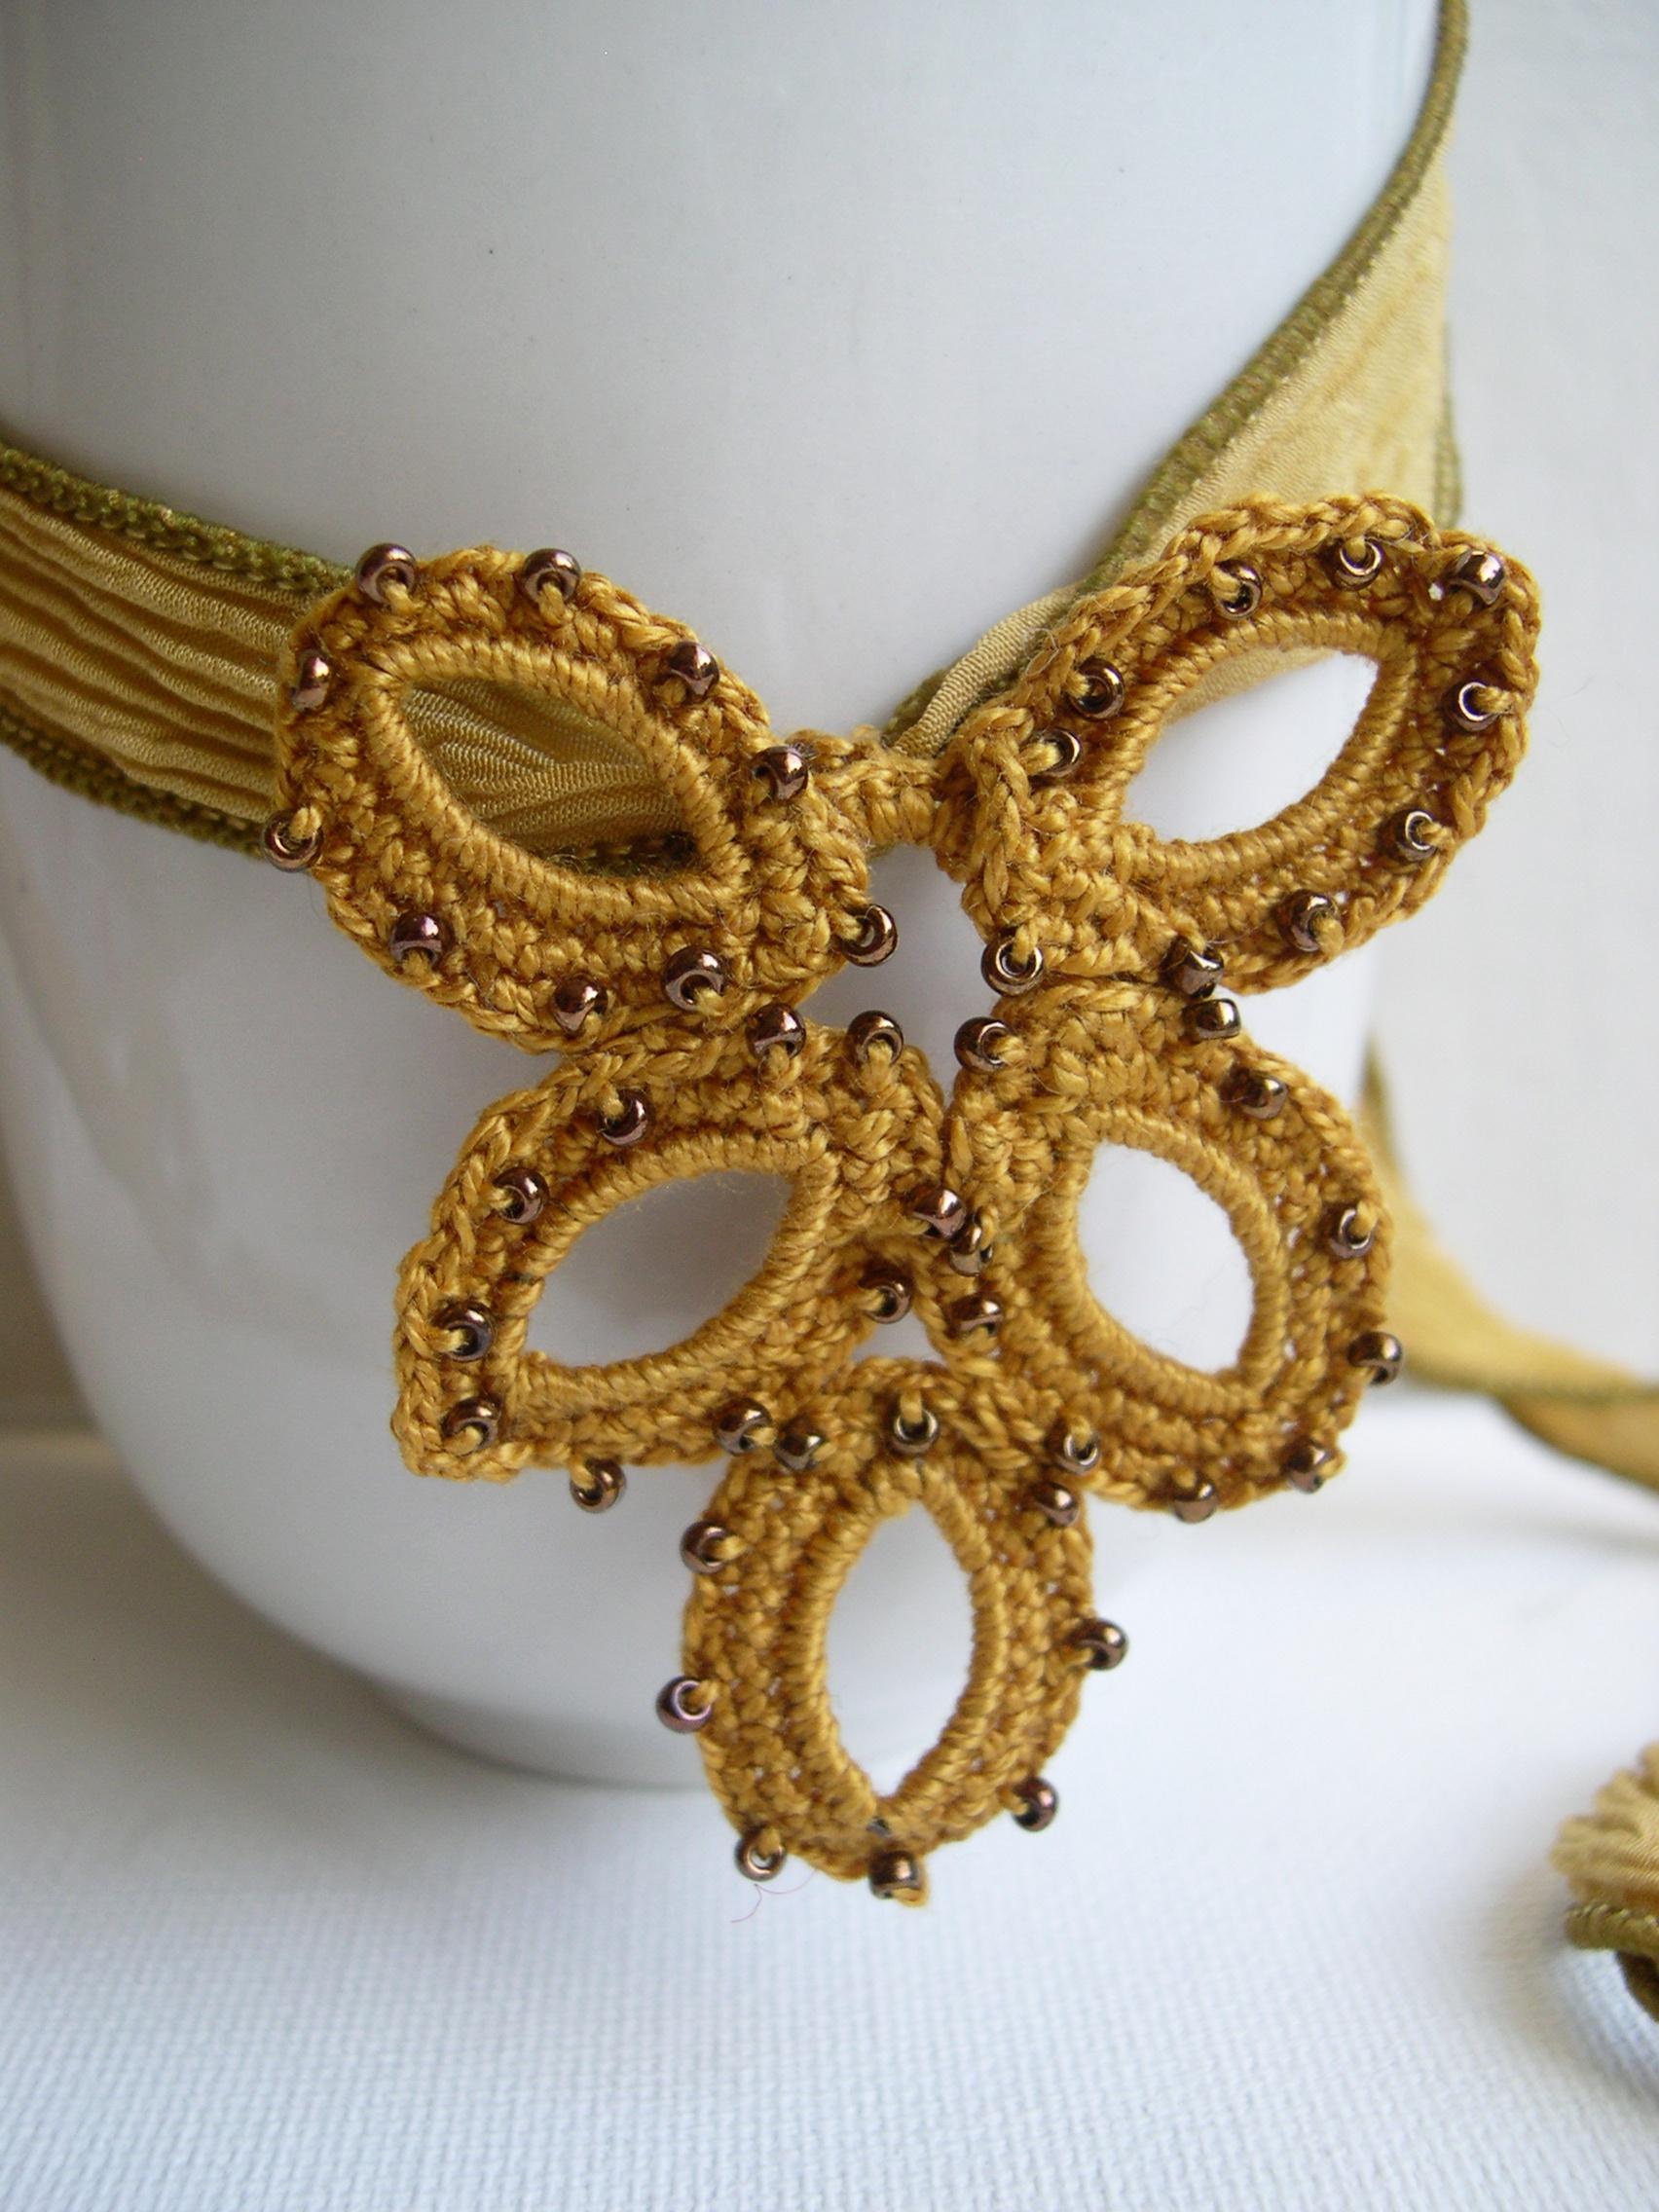 Mustard pendant necklace girlfriend gift idea bridesmaid for Mustard colored costume jewelry